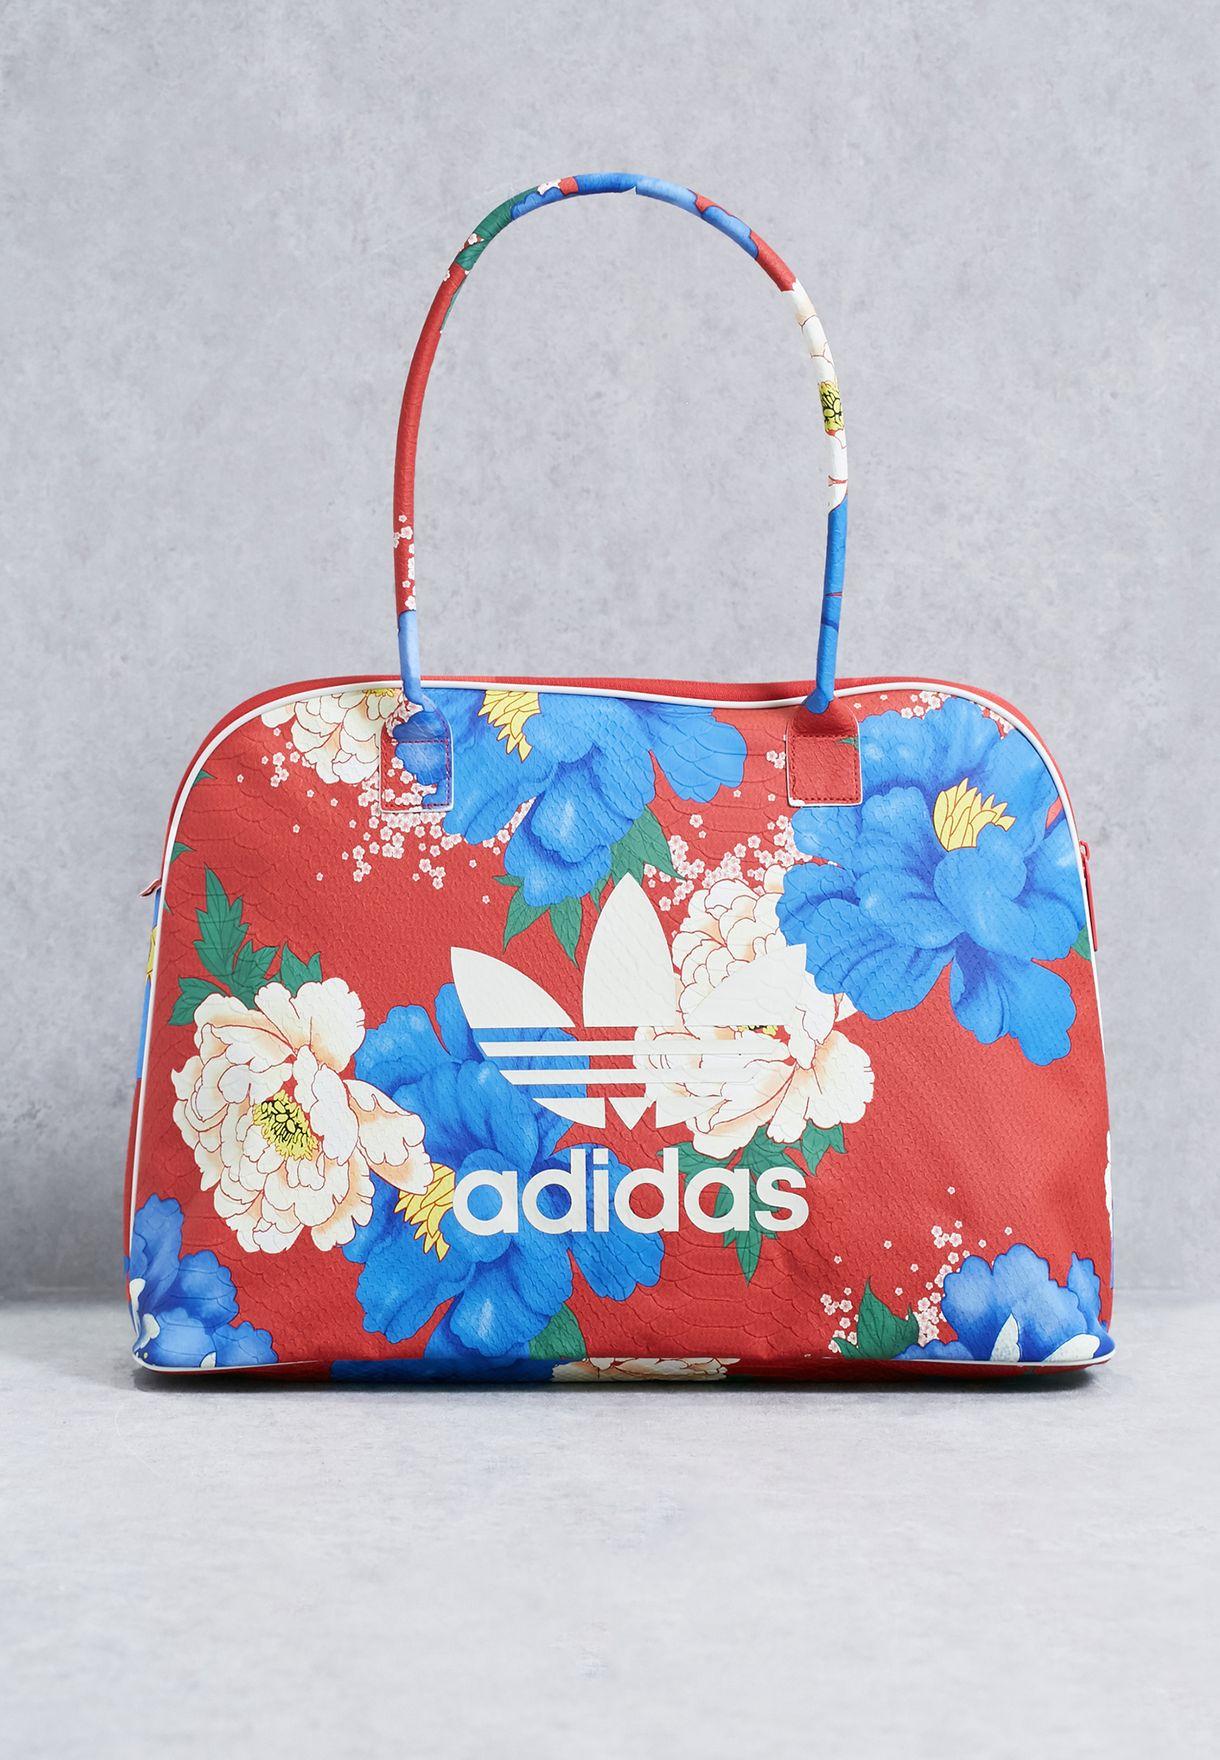 99bf1a63635 Shop adidas Originals prints Floral Shopper BK2140 for Women in Qatar -  AD478AC44WLJ